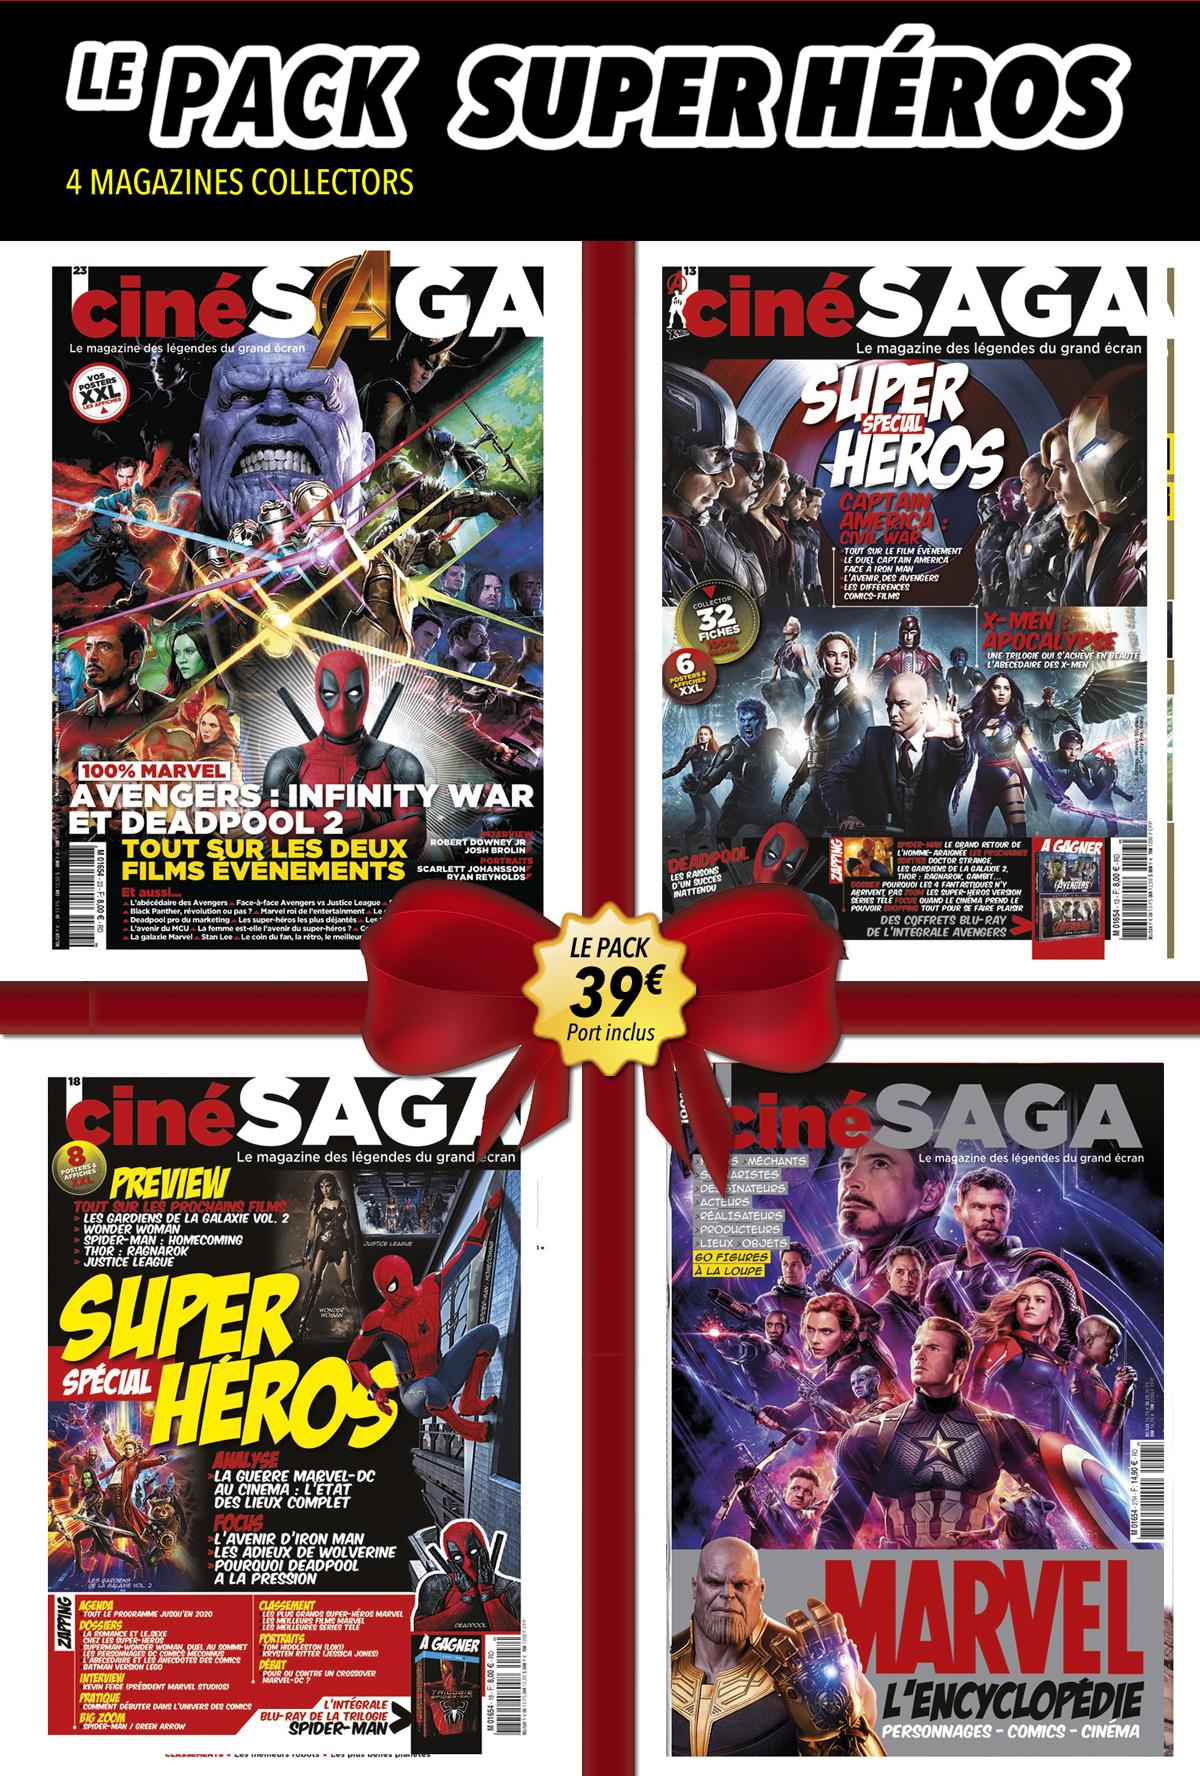 Cine Saga Pack Super Heros Make My Mag Shop